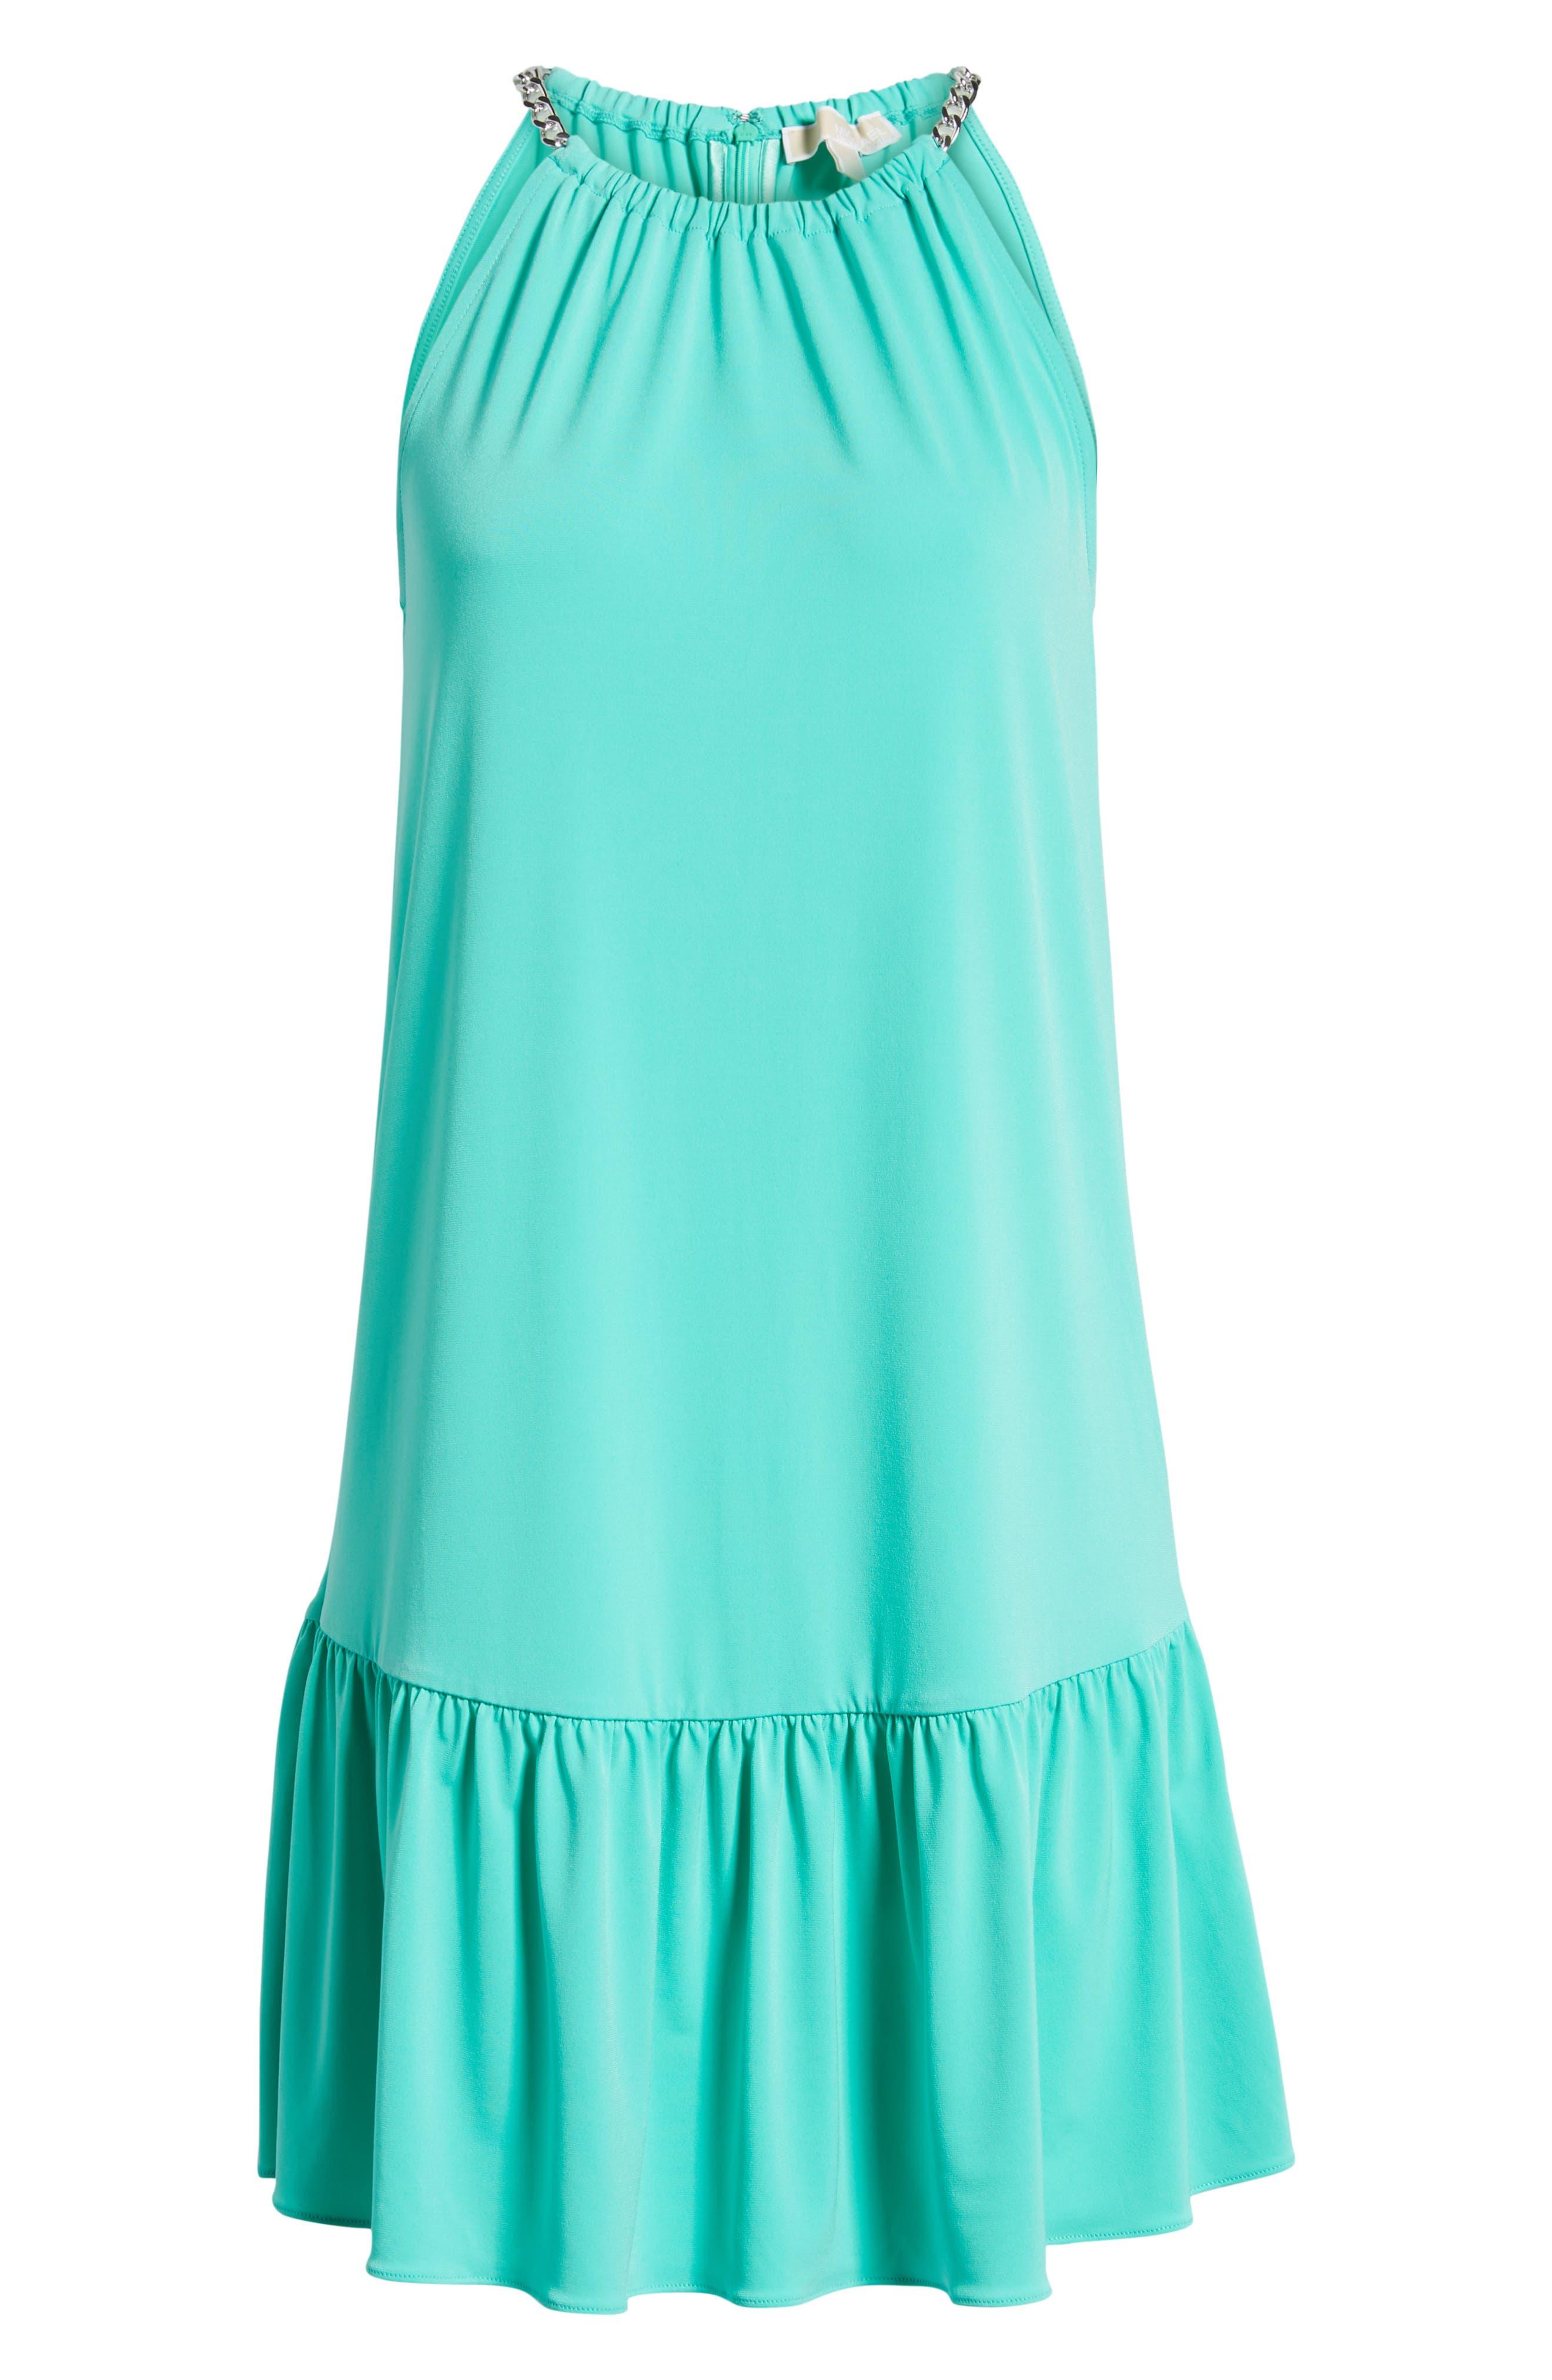 Chain Detail Halter Dress,                             Alternate thumbnail 7, color,                             Aqua